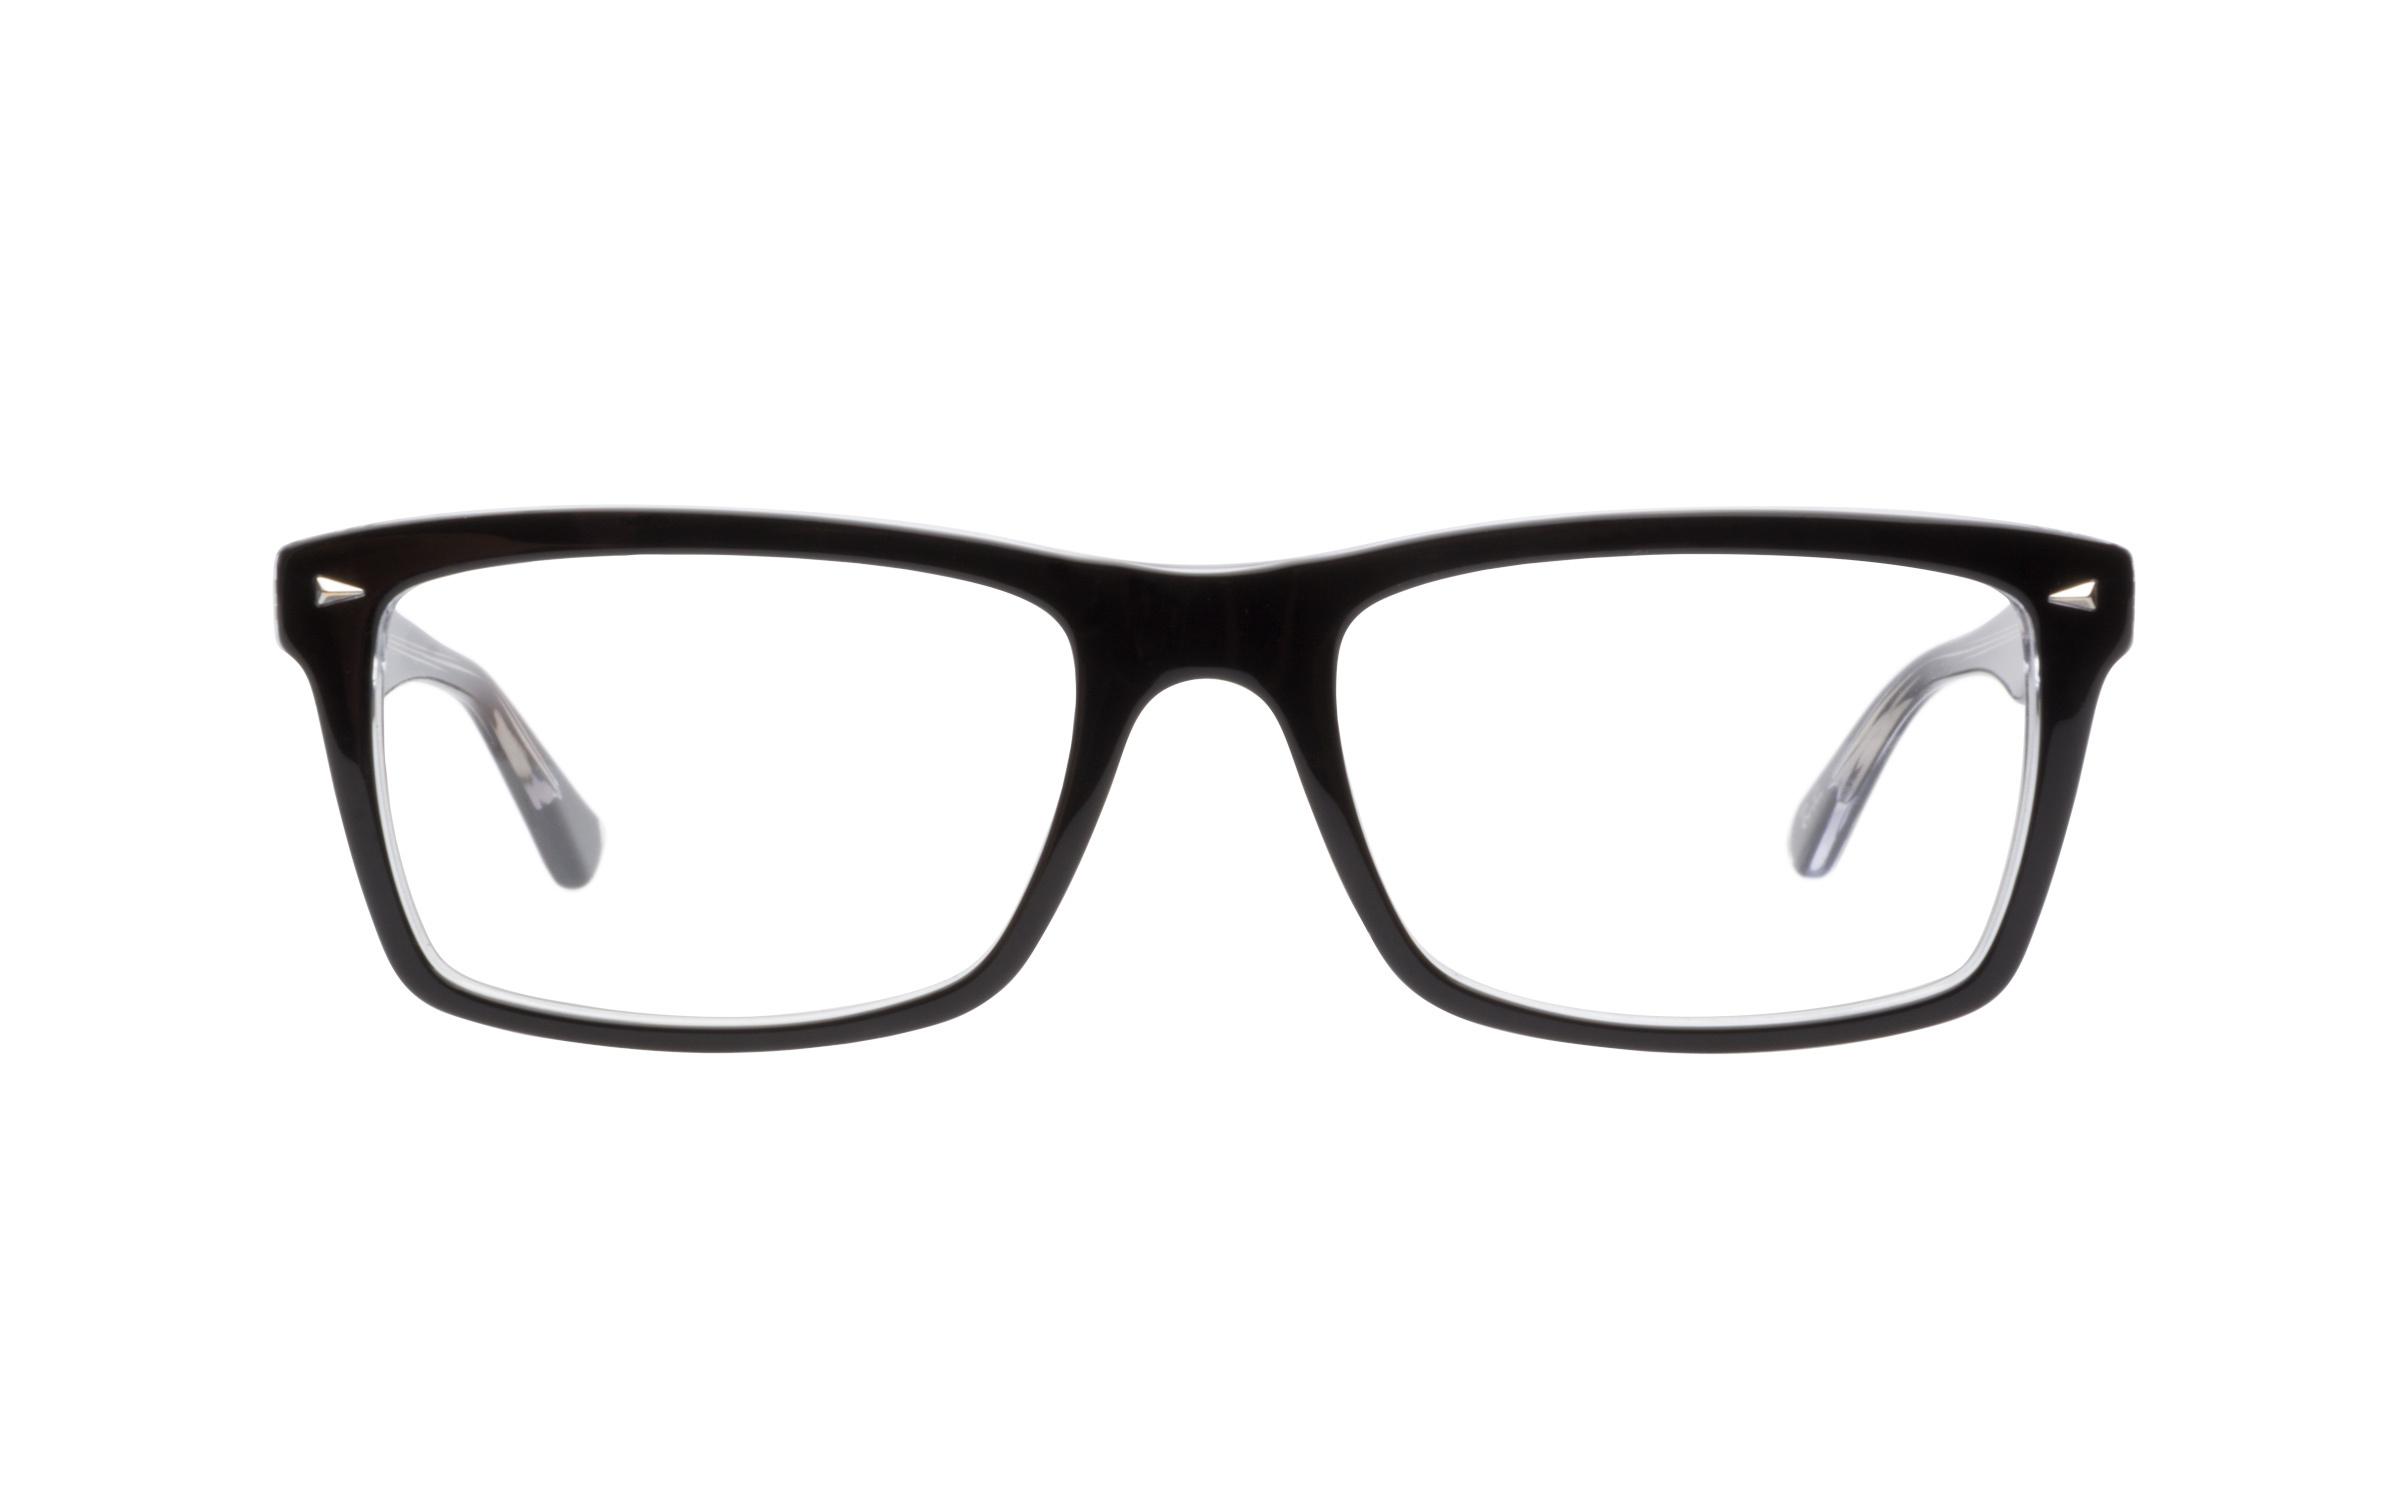 Ray-Ban RB5287 2034 Eyeglasses and Frame in Transparent Black | Acetate - Online Coastal